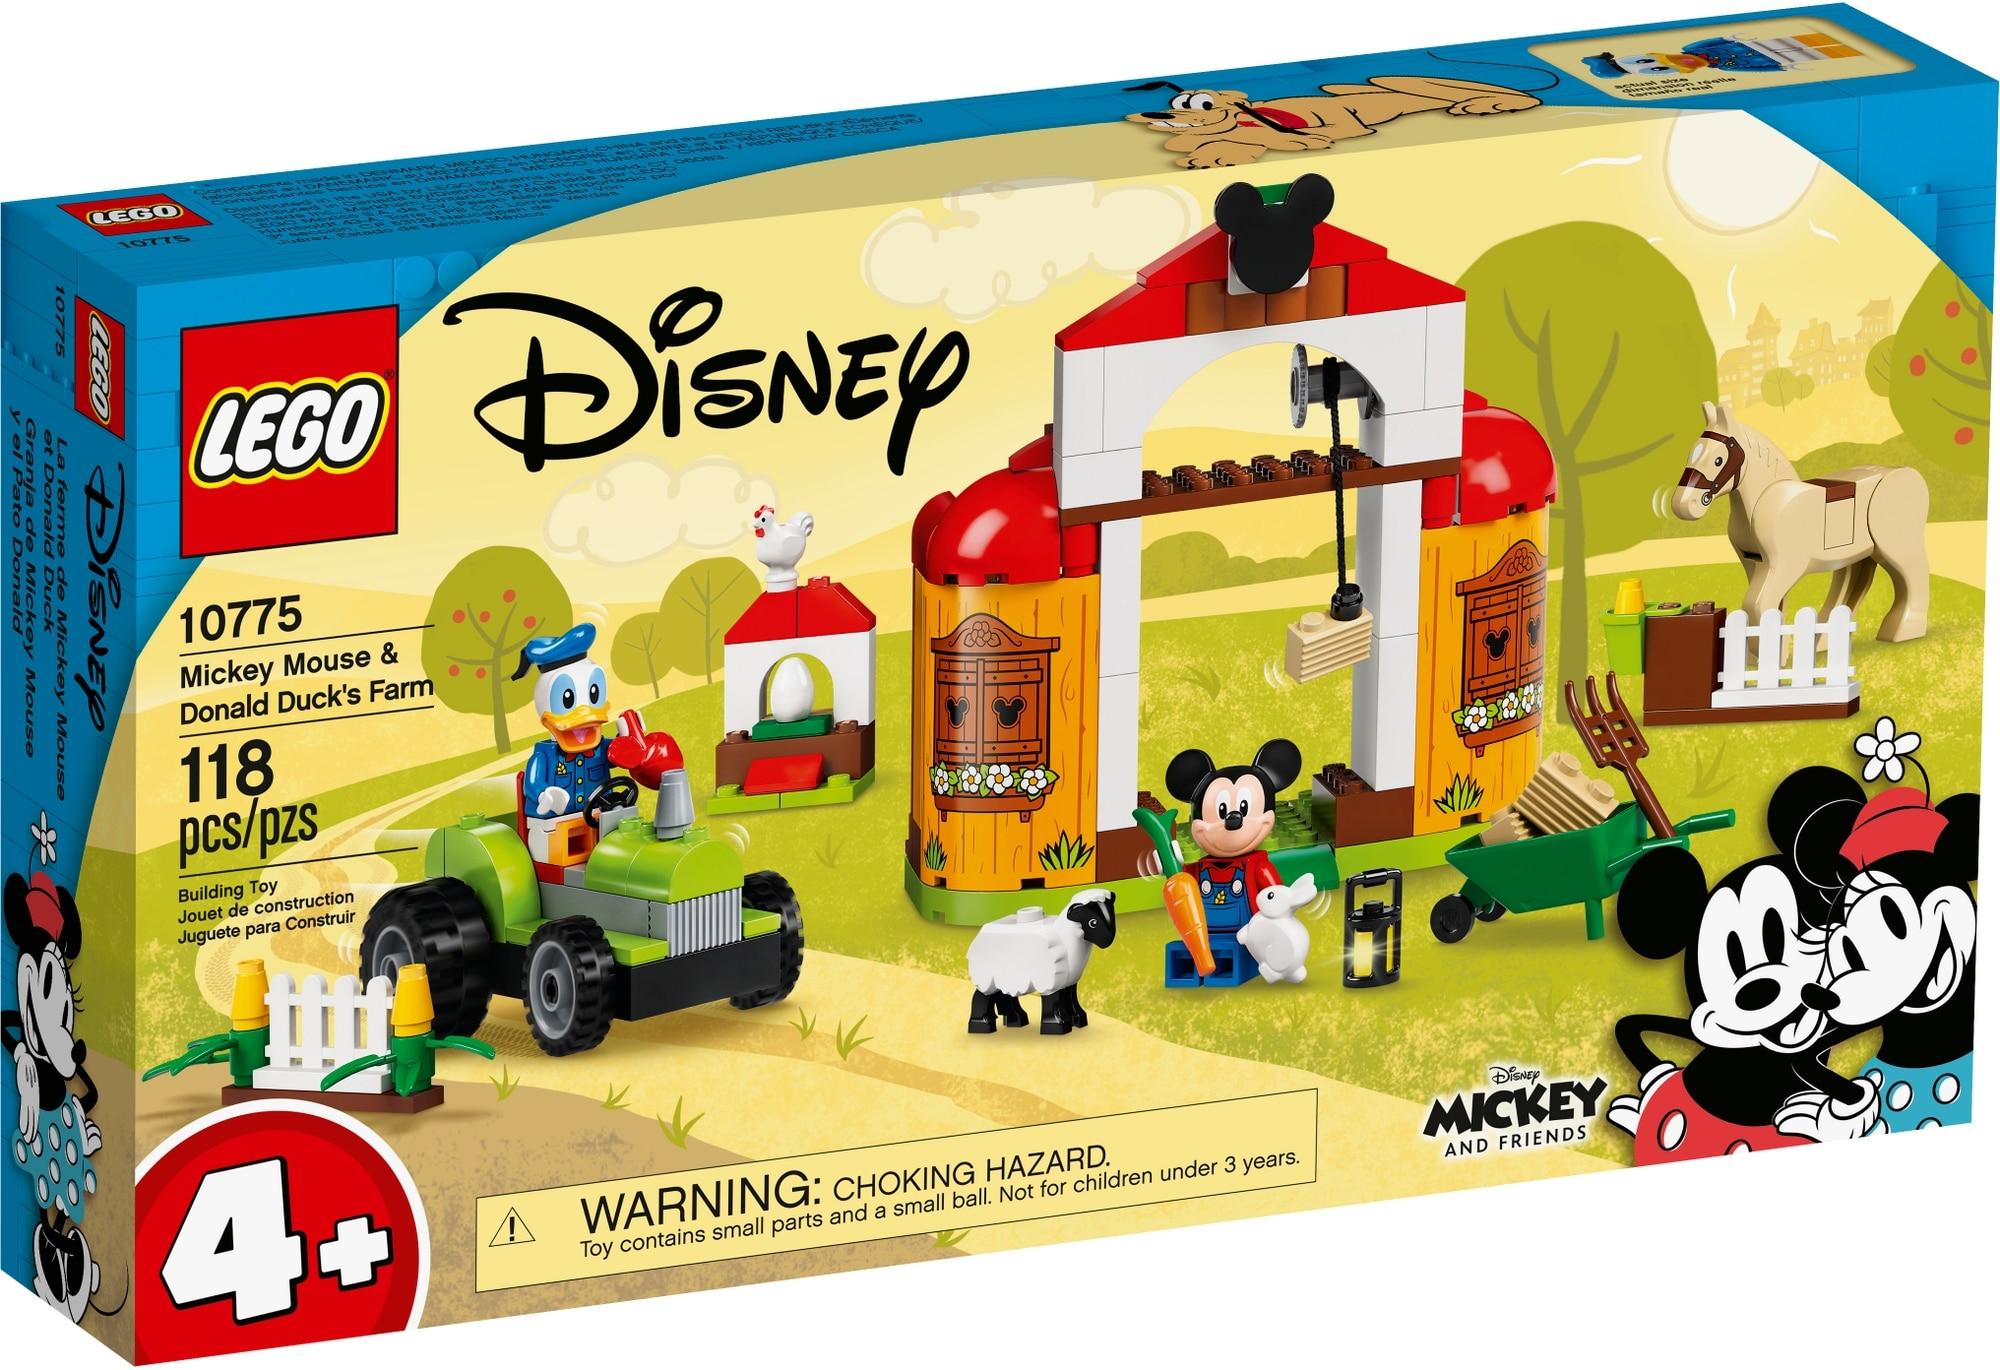 LEGO Disney 10775 Mickys Und Donald Duck's Farm 2